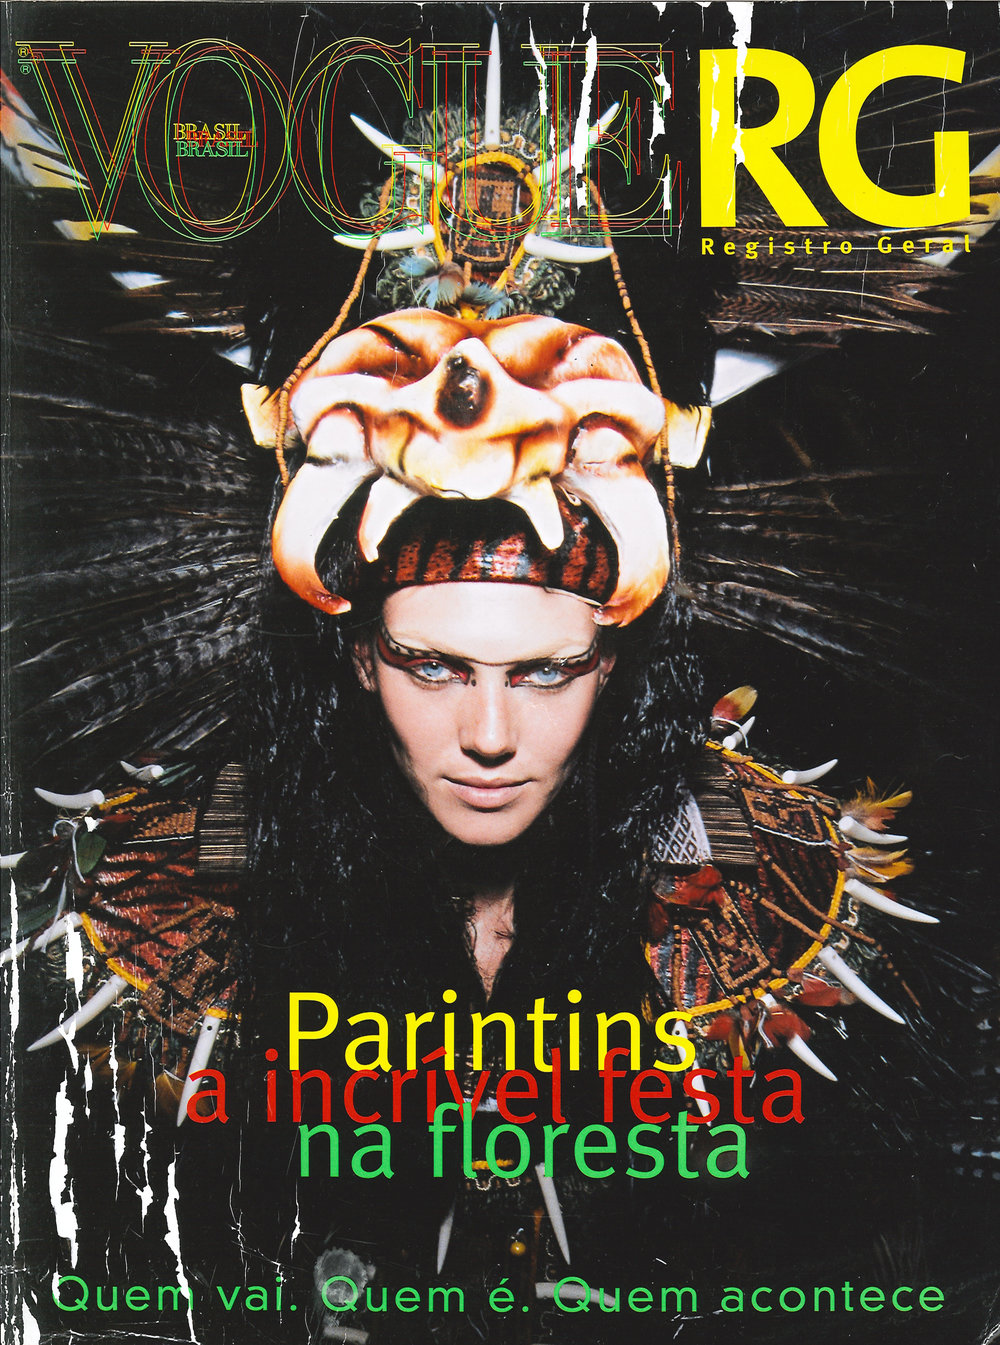 brazilian Vogue 1.jpg